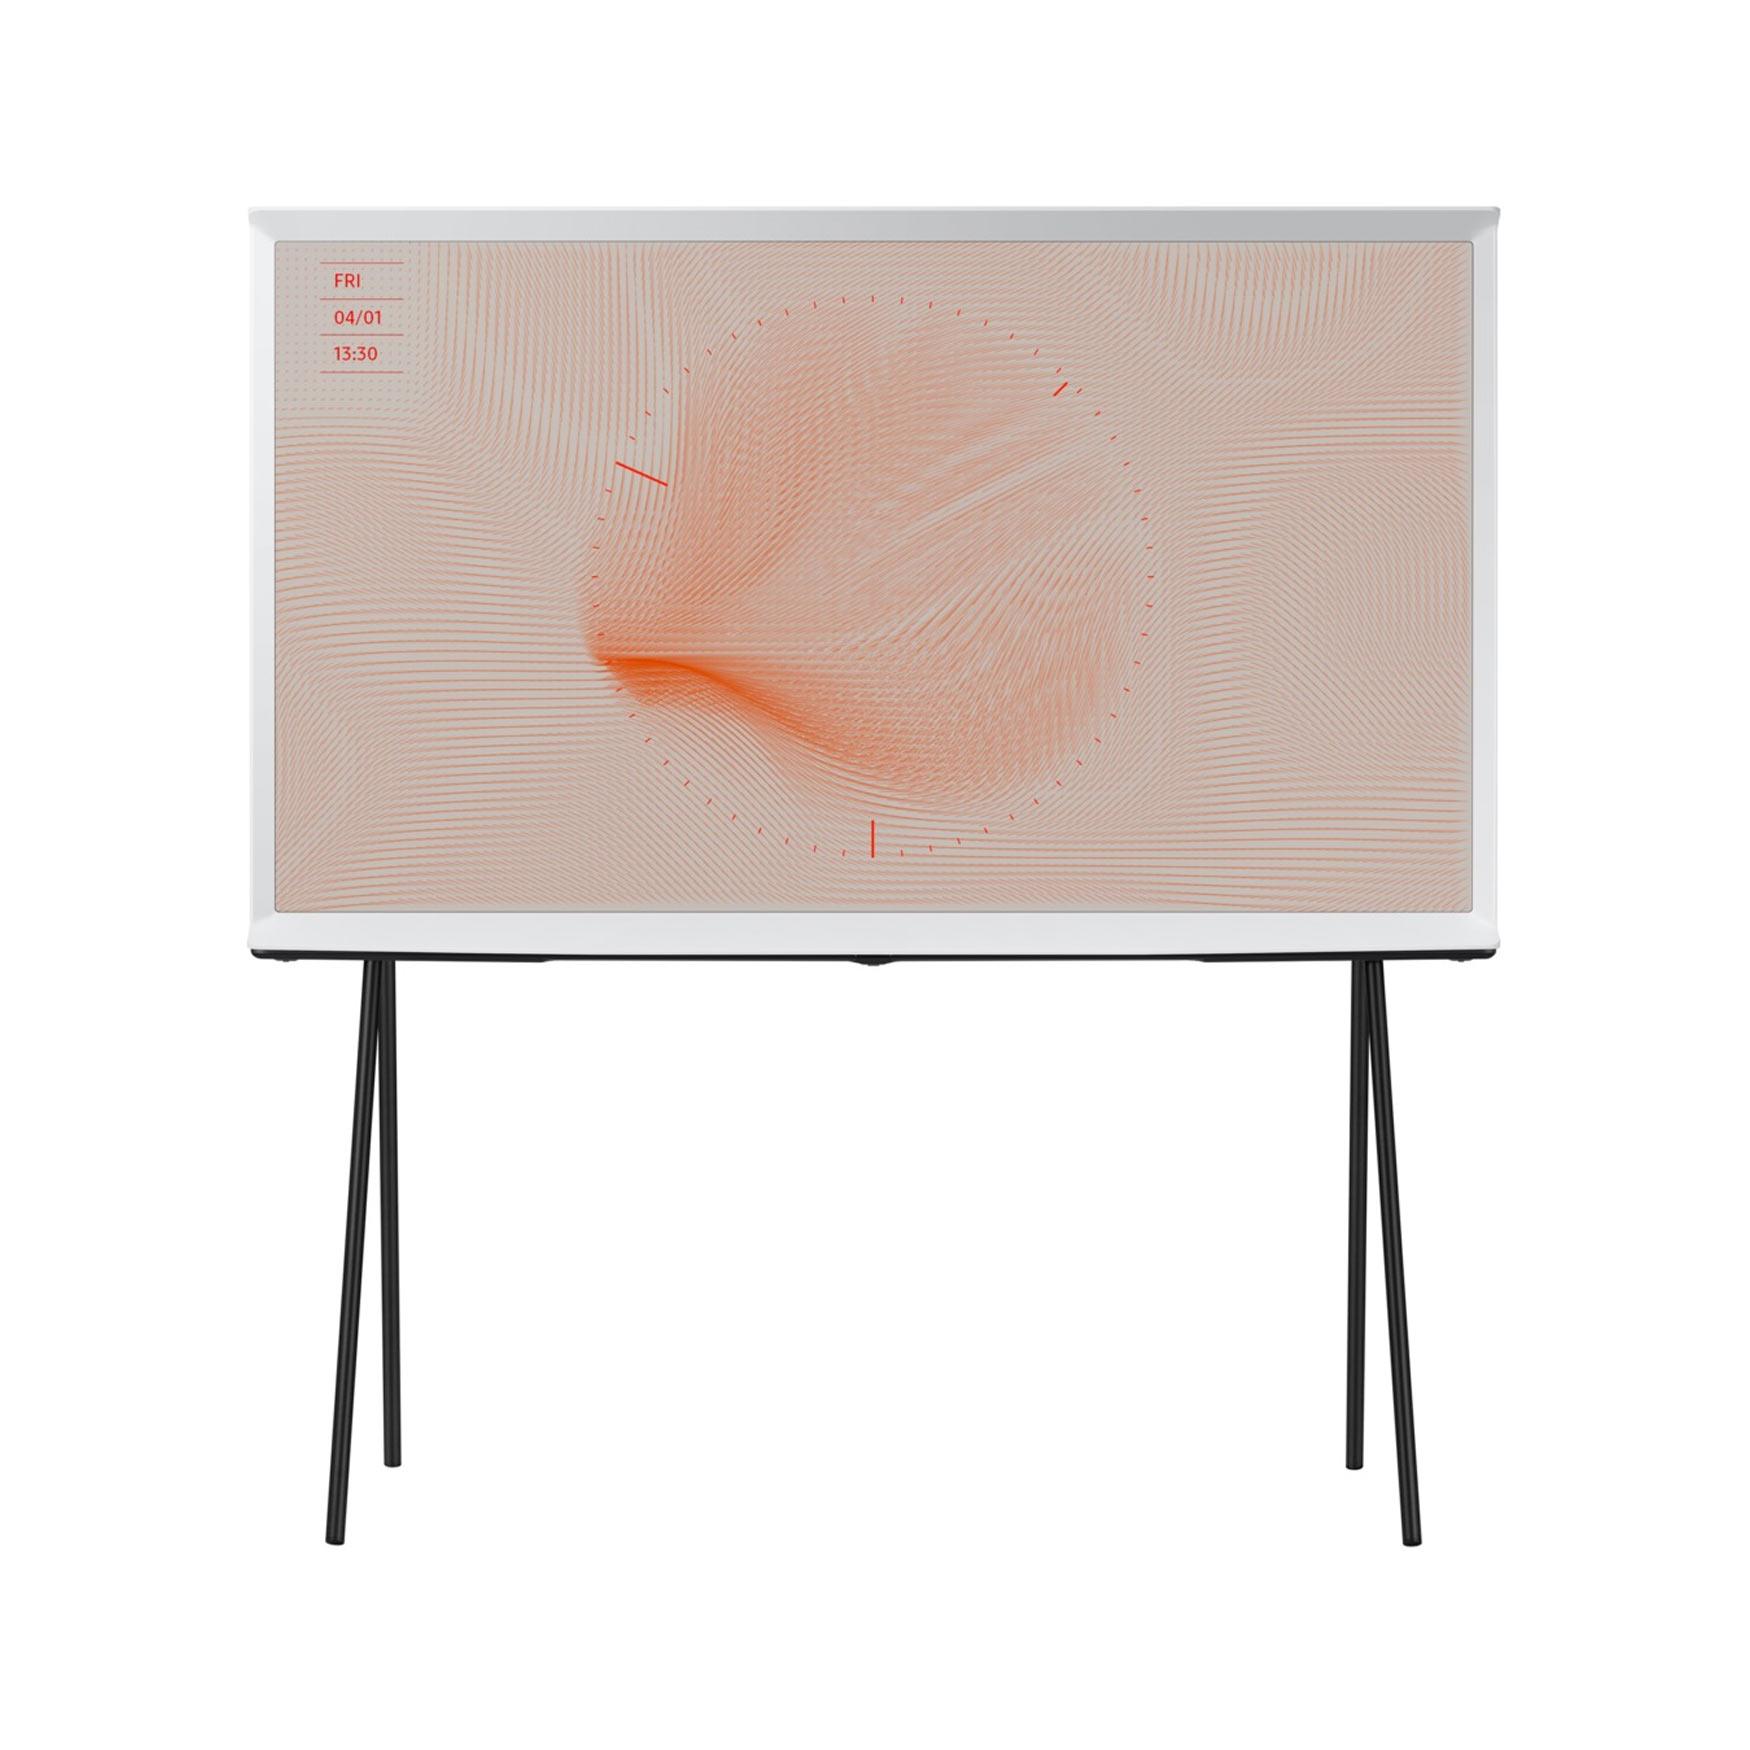 QLED TV Samsung QE 55LS01TAUXXH Serif